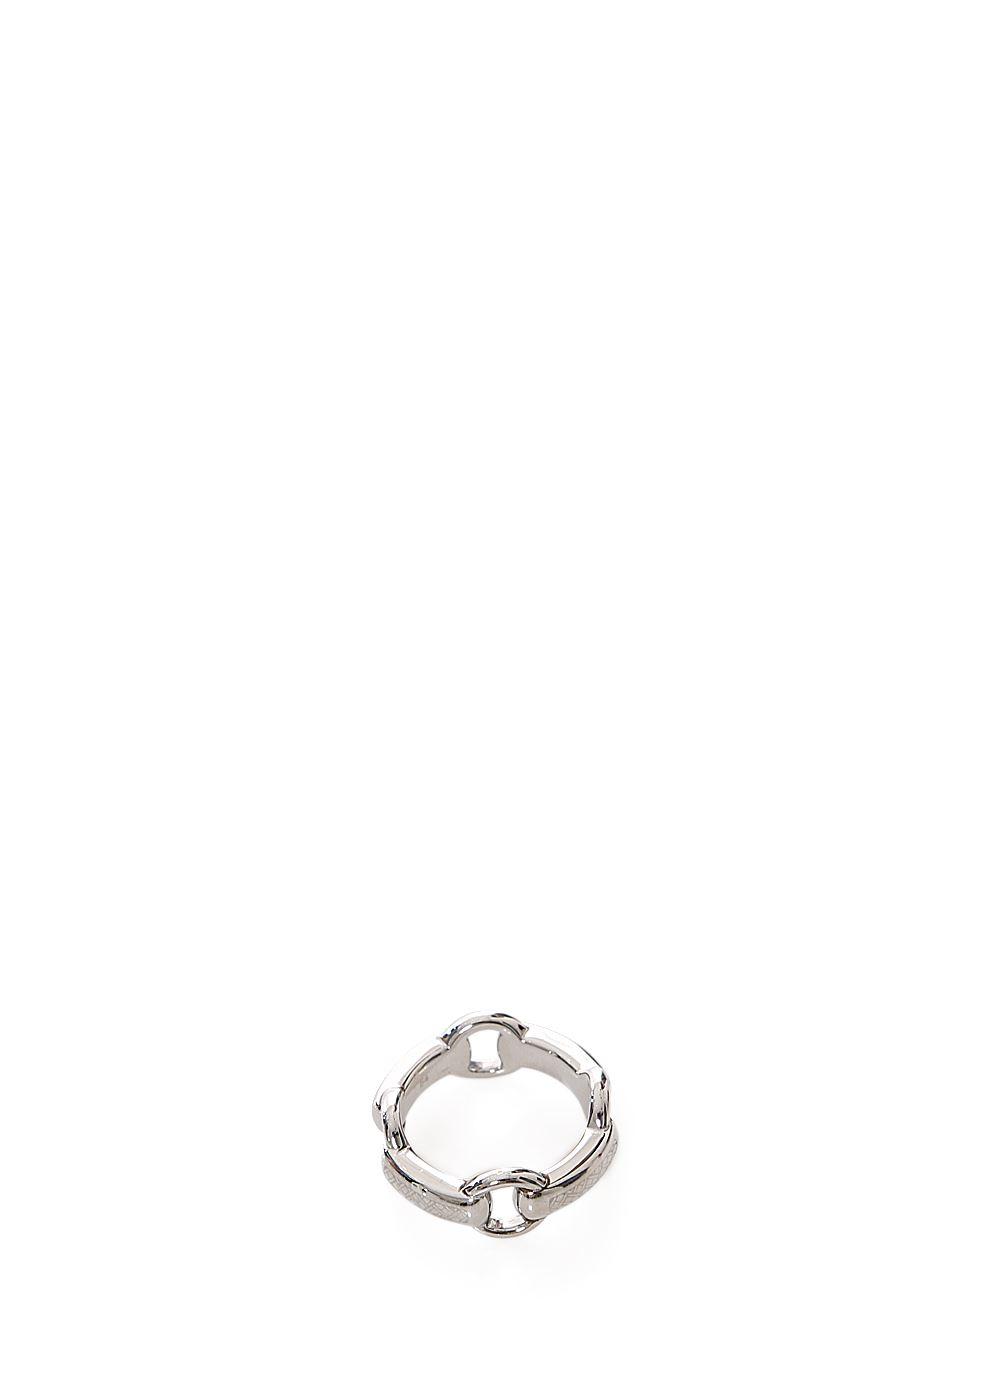 Tommy Hilfiger Accessories - Γυναικείο Δαχτυλίδι TOMMY HILFIGER από ατσάλι